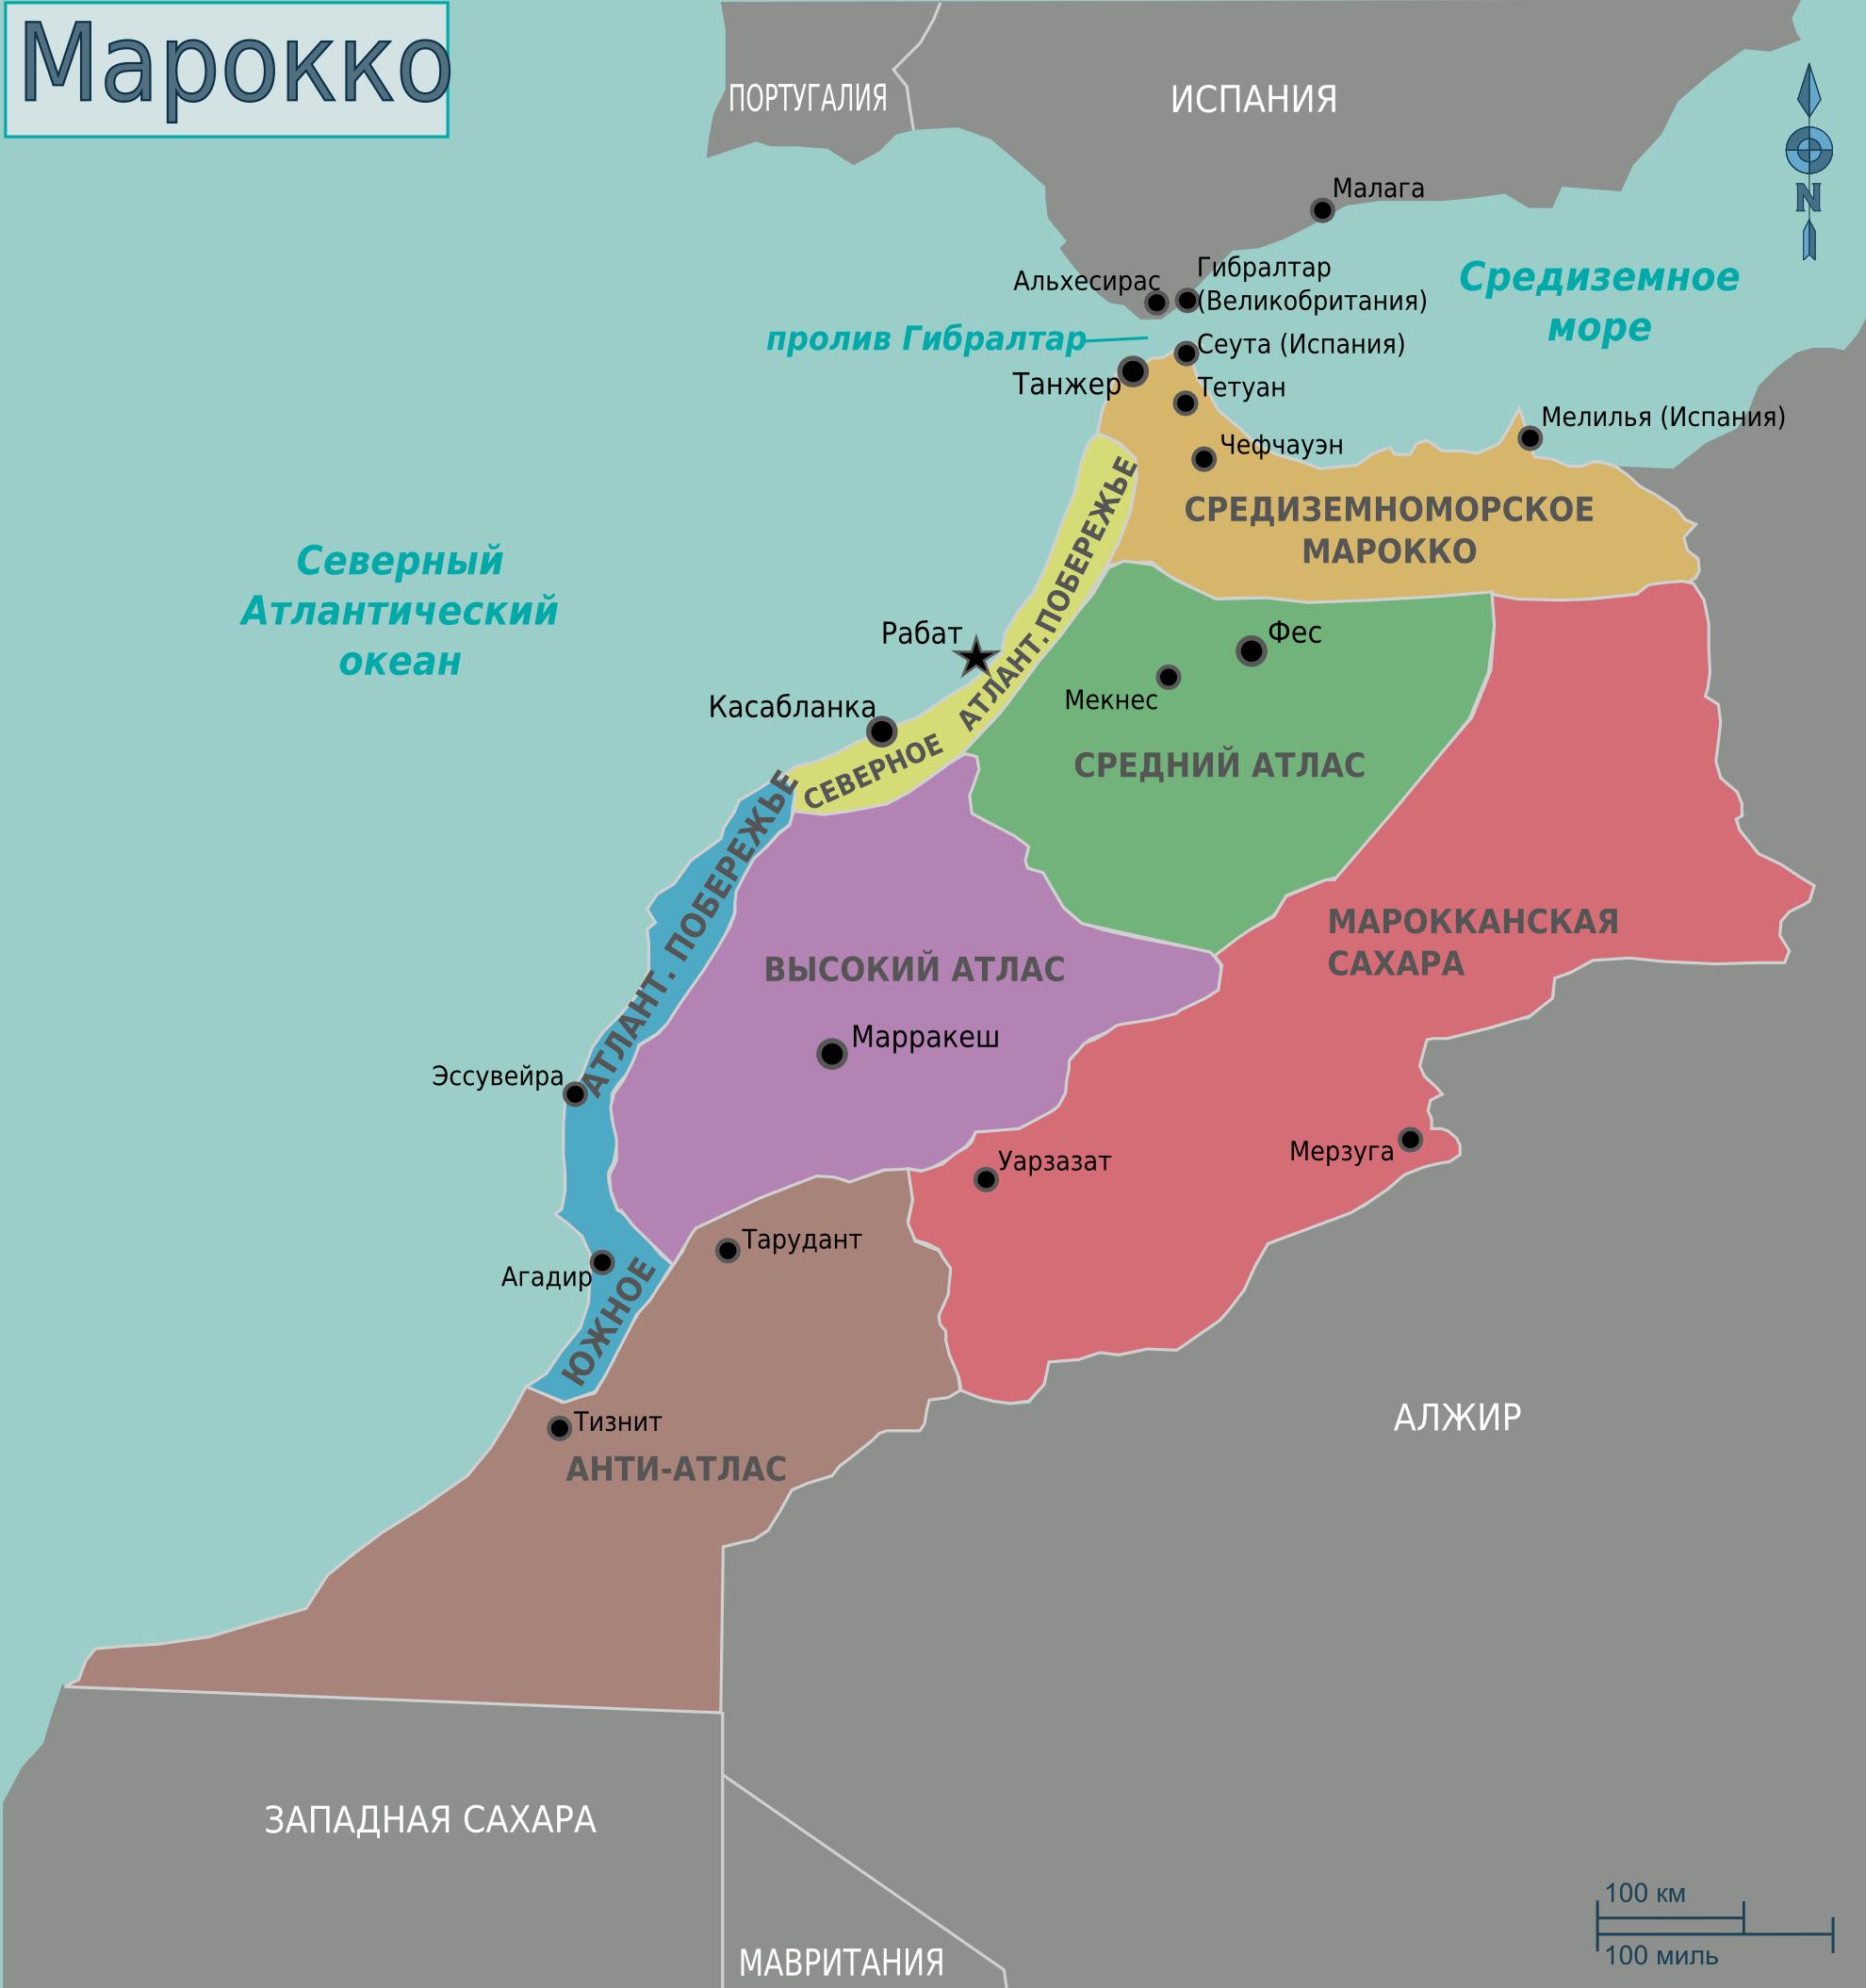 File:Map of Morocco ru.png - Wikimedia Commons on mozambique map, iraq map, algeria map, ghana map, eritrea map, france map, liberia map, europe map, italy map, kenya map, senegal map, rwanda map, malawi map, ethiopia map, sierra leone map, mali map, mauritania map, namibia map, angola map, brazil map, sudan map, libya map, egypt map, israel map, india map, cameroon map, mauritius map, saudi arabia map, spain map, tunisia map, mexico map, poland map, niger map, western hemisphere map, nigeria map, japan map, moldova map,